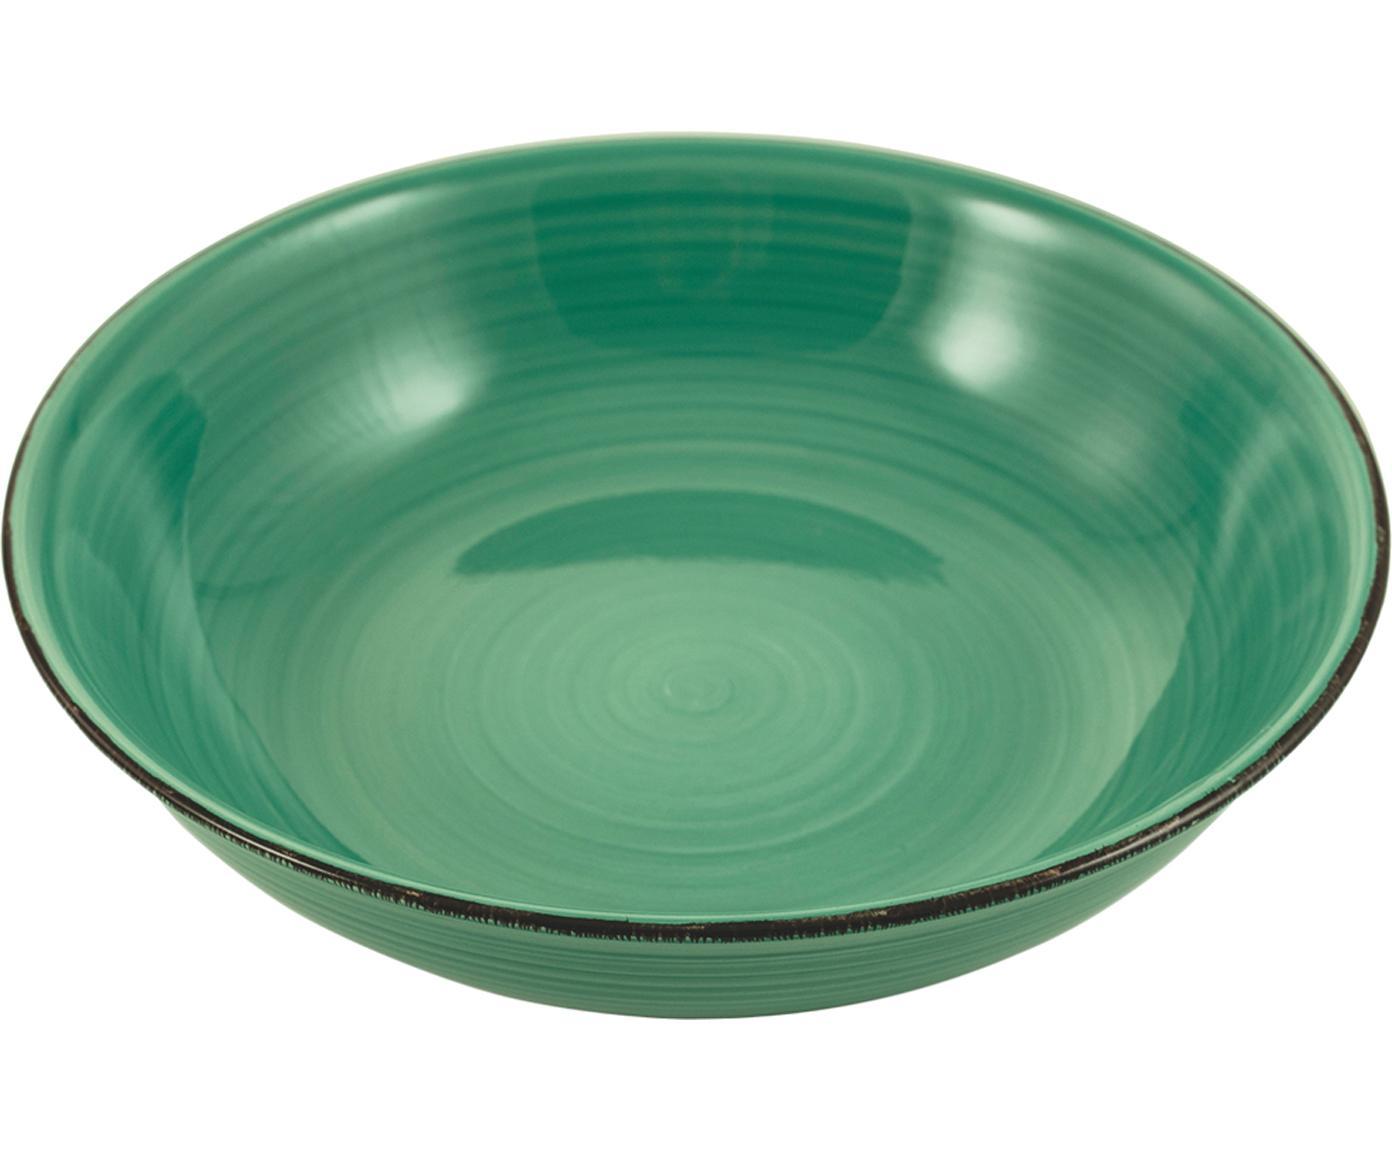 Serveerschalen Baita, Keramiek, Turquoise, Ø 29 x H 7 cm